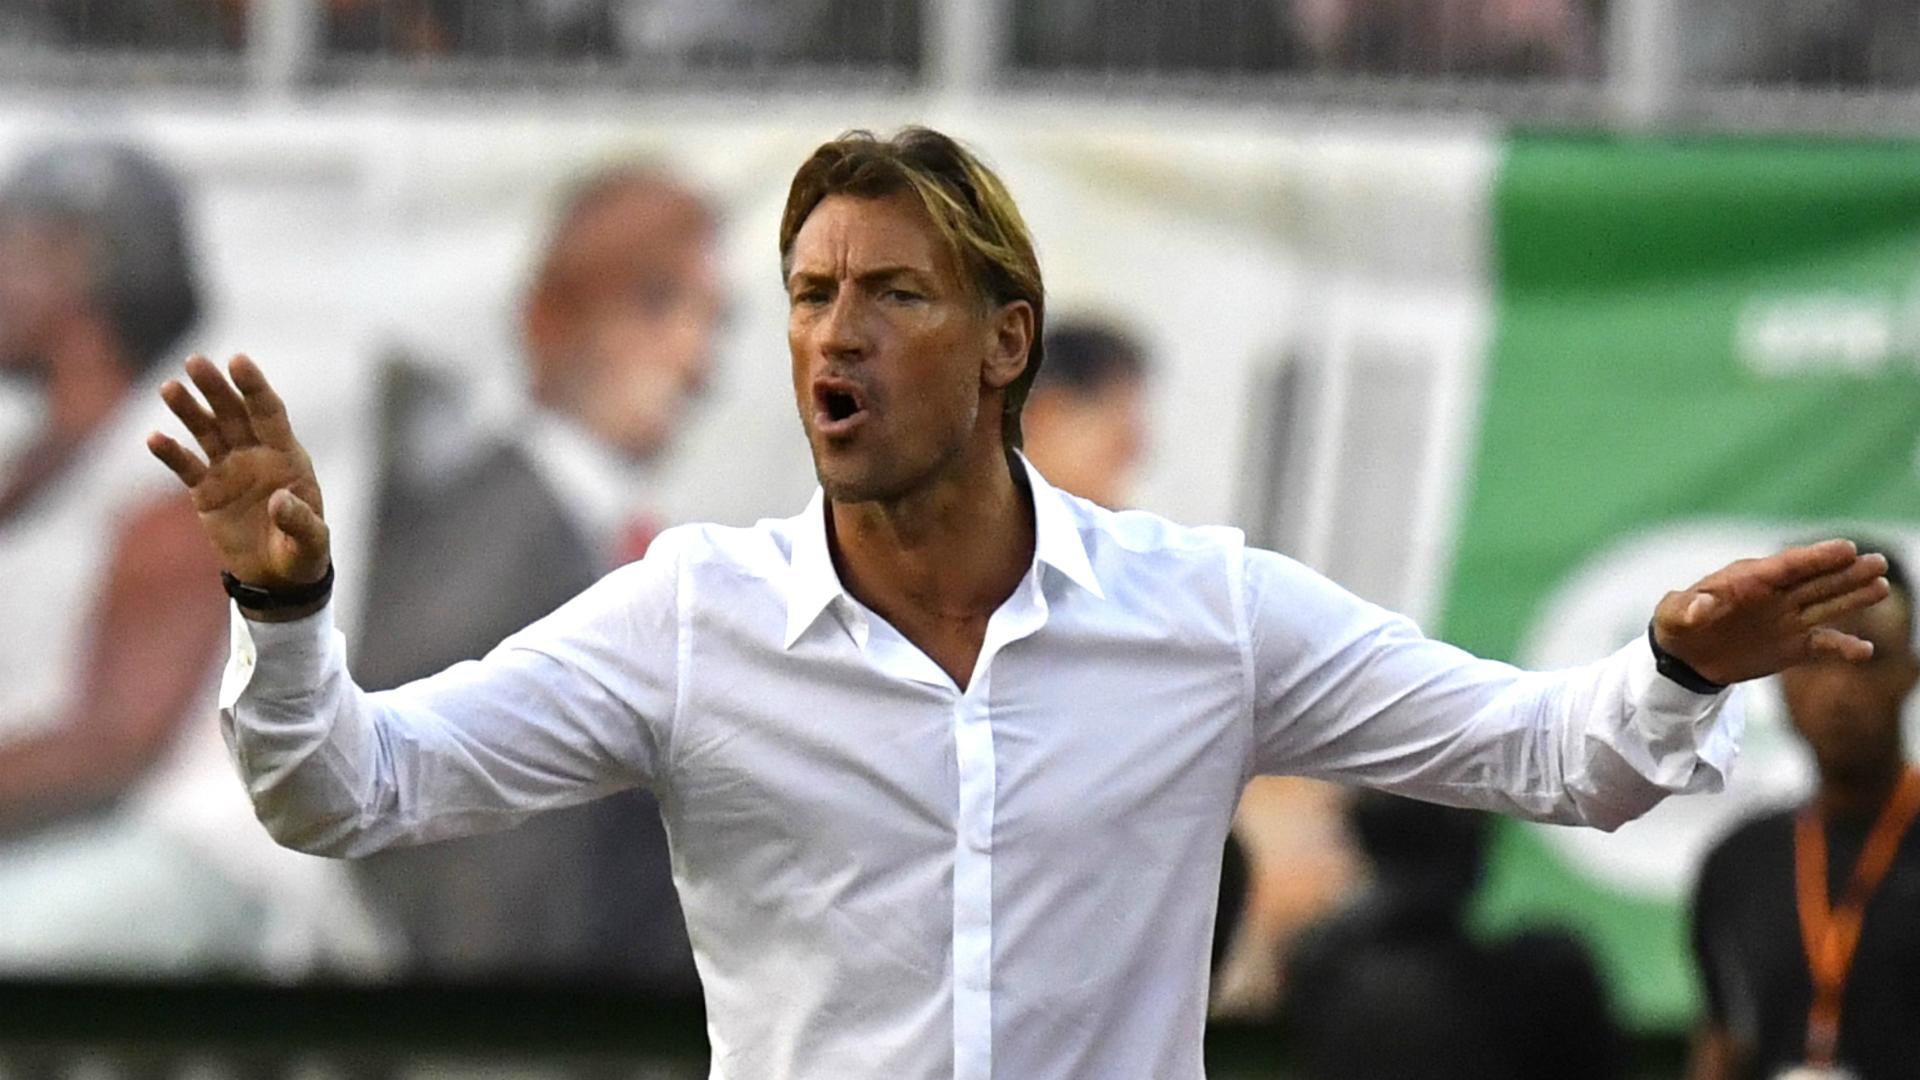 Orlando Pirates should replace head coach Zinnbauer with Renard - Vilakazi